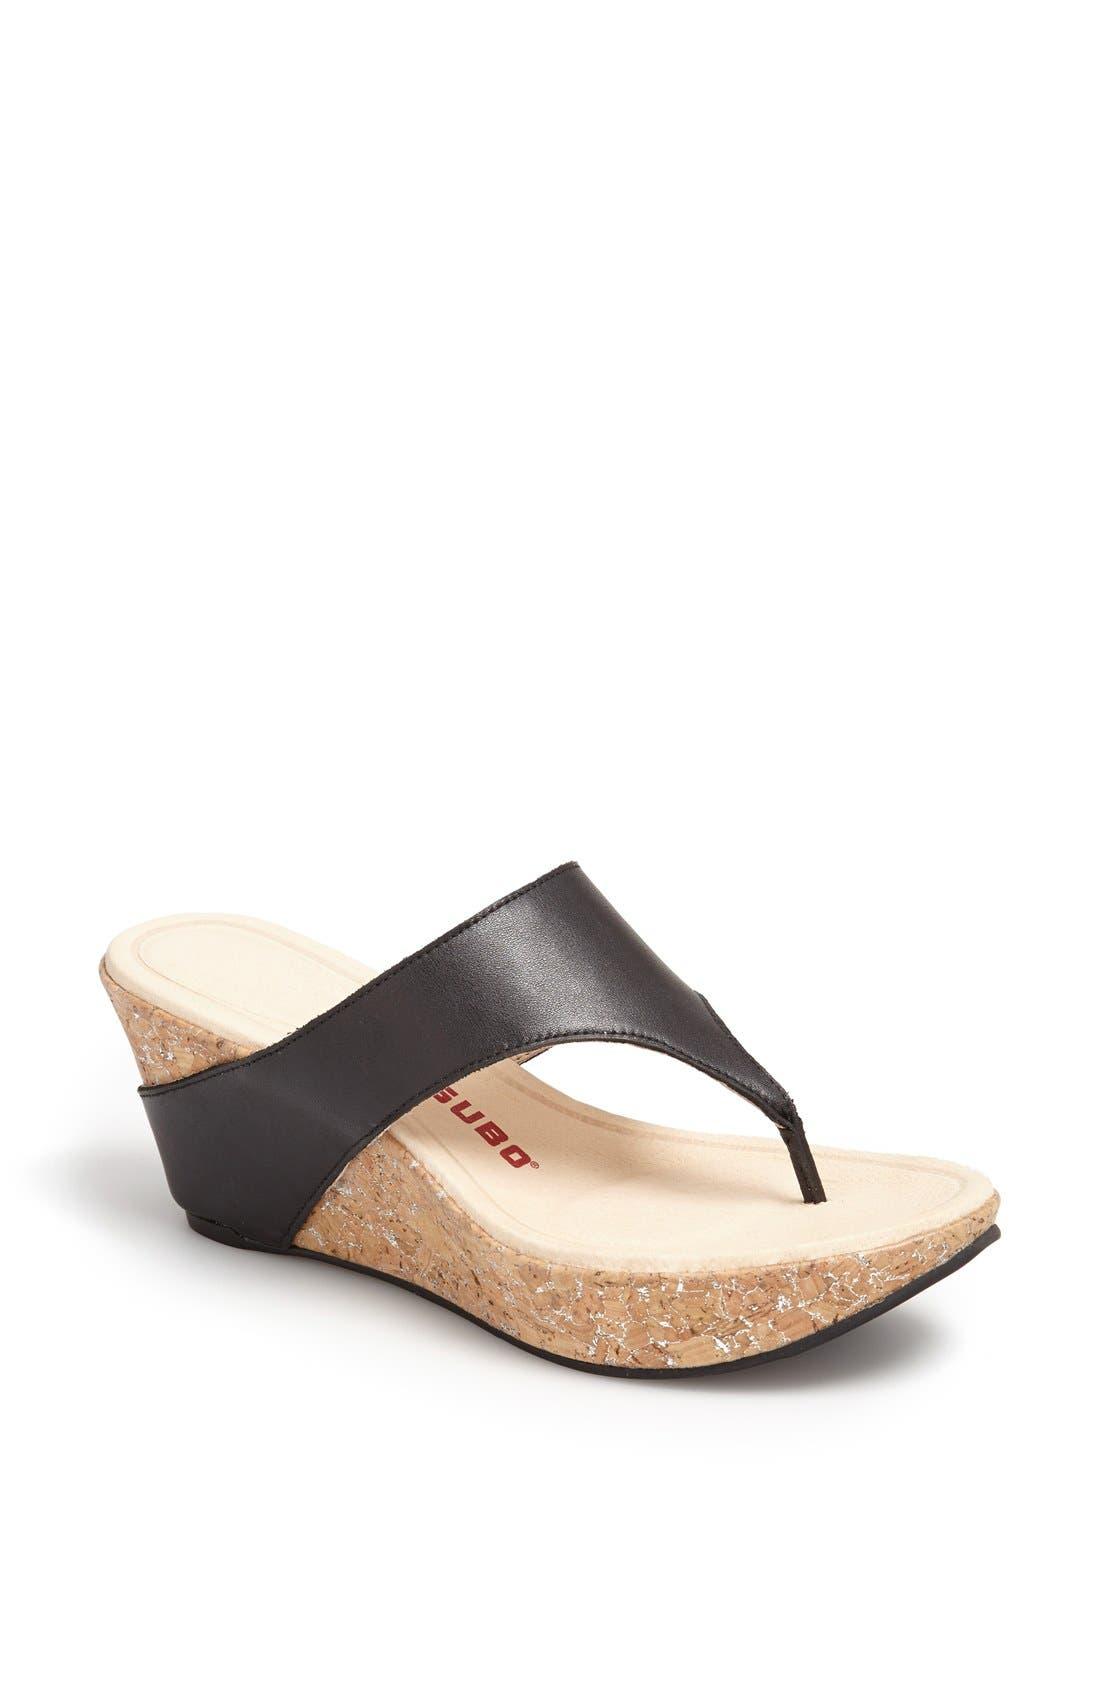 Main Image - Tsubo 'Odelle' Wedge Thong Sandal